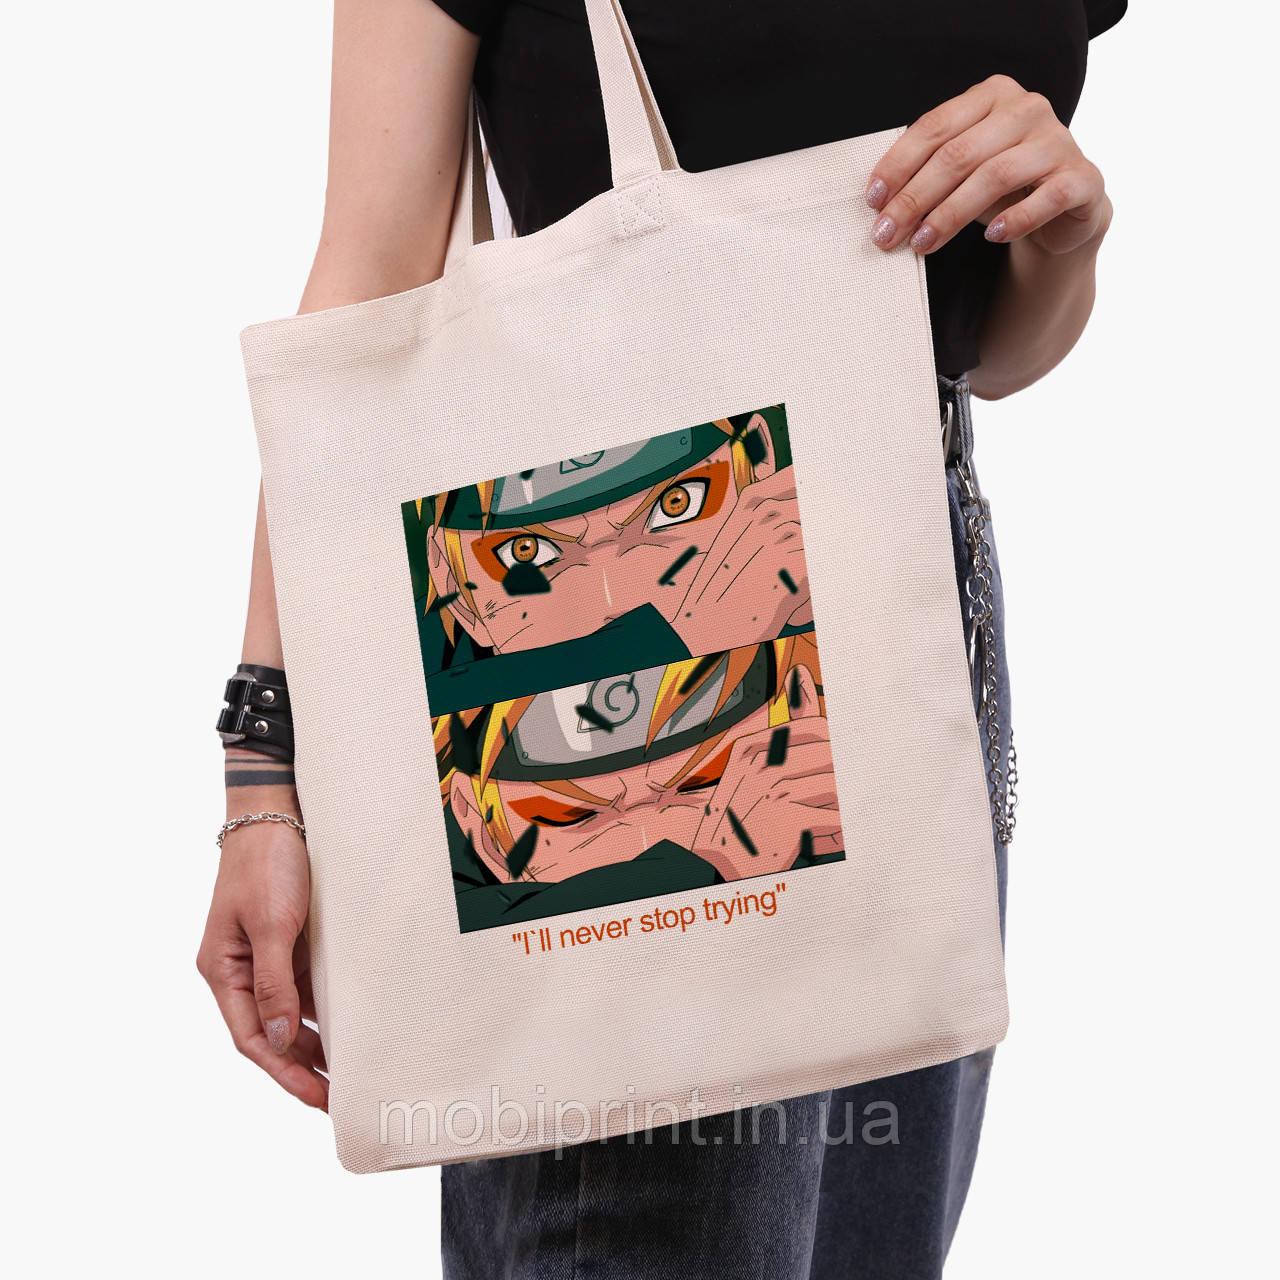 Эко сумка шоппер Наруто Узумаки (Naruto Uzumaki) (9227-2816)  41*35 см